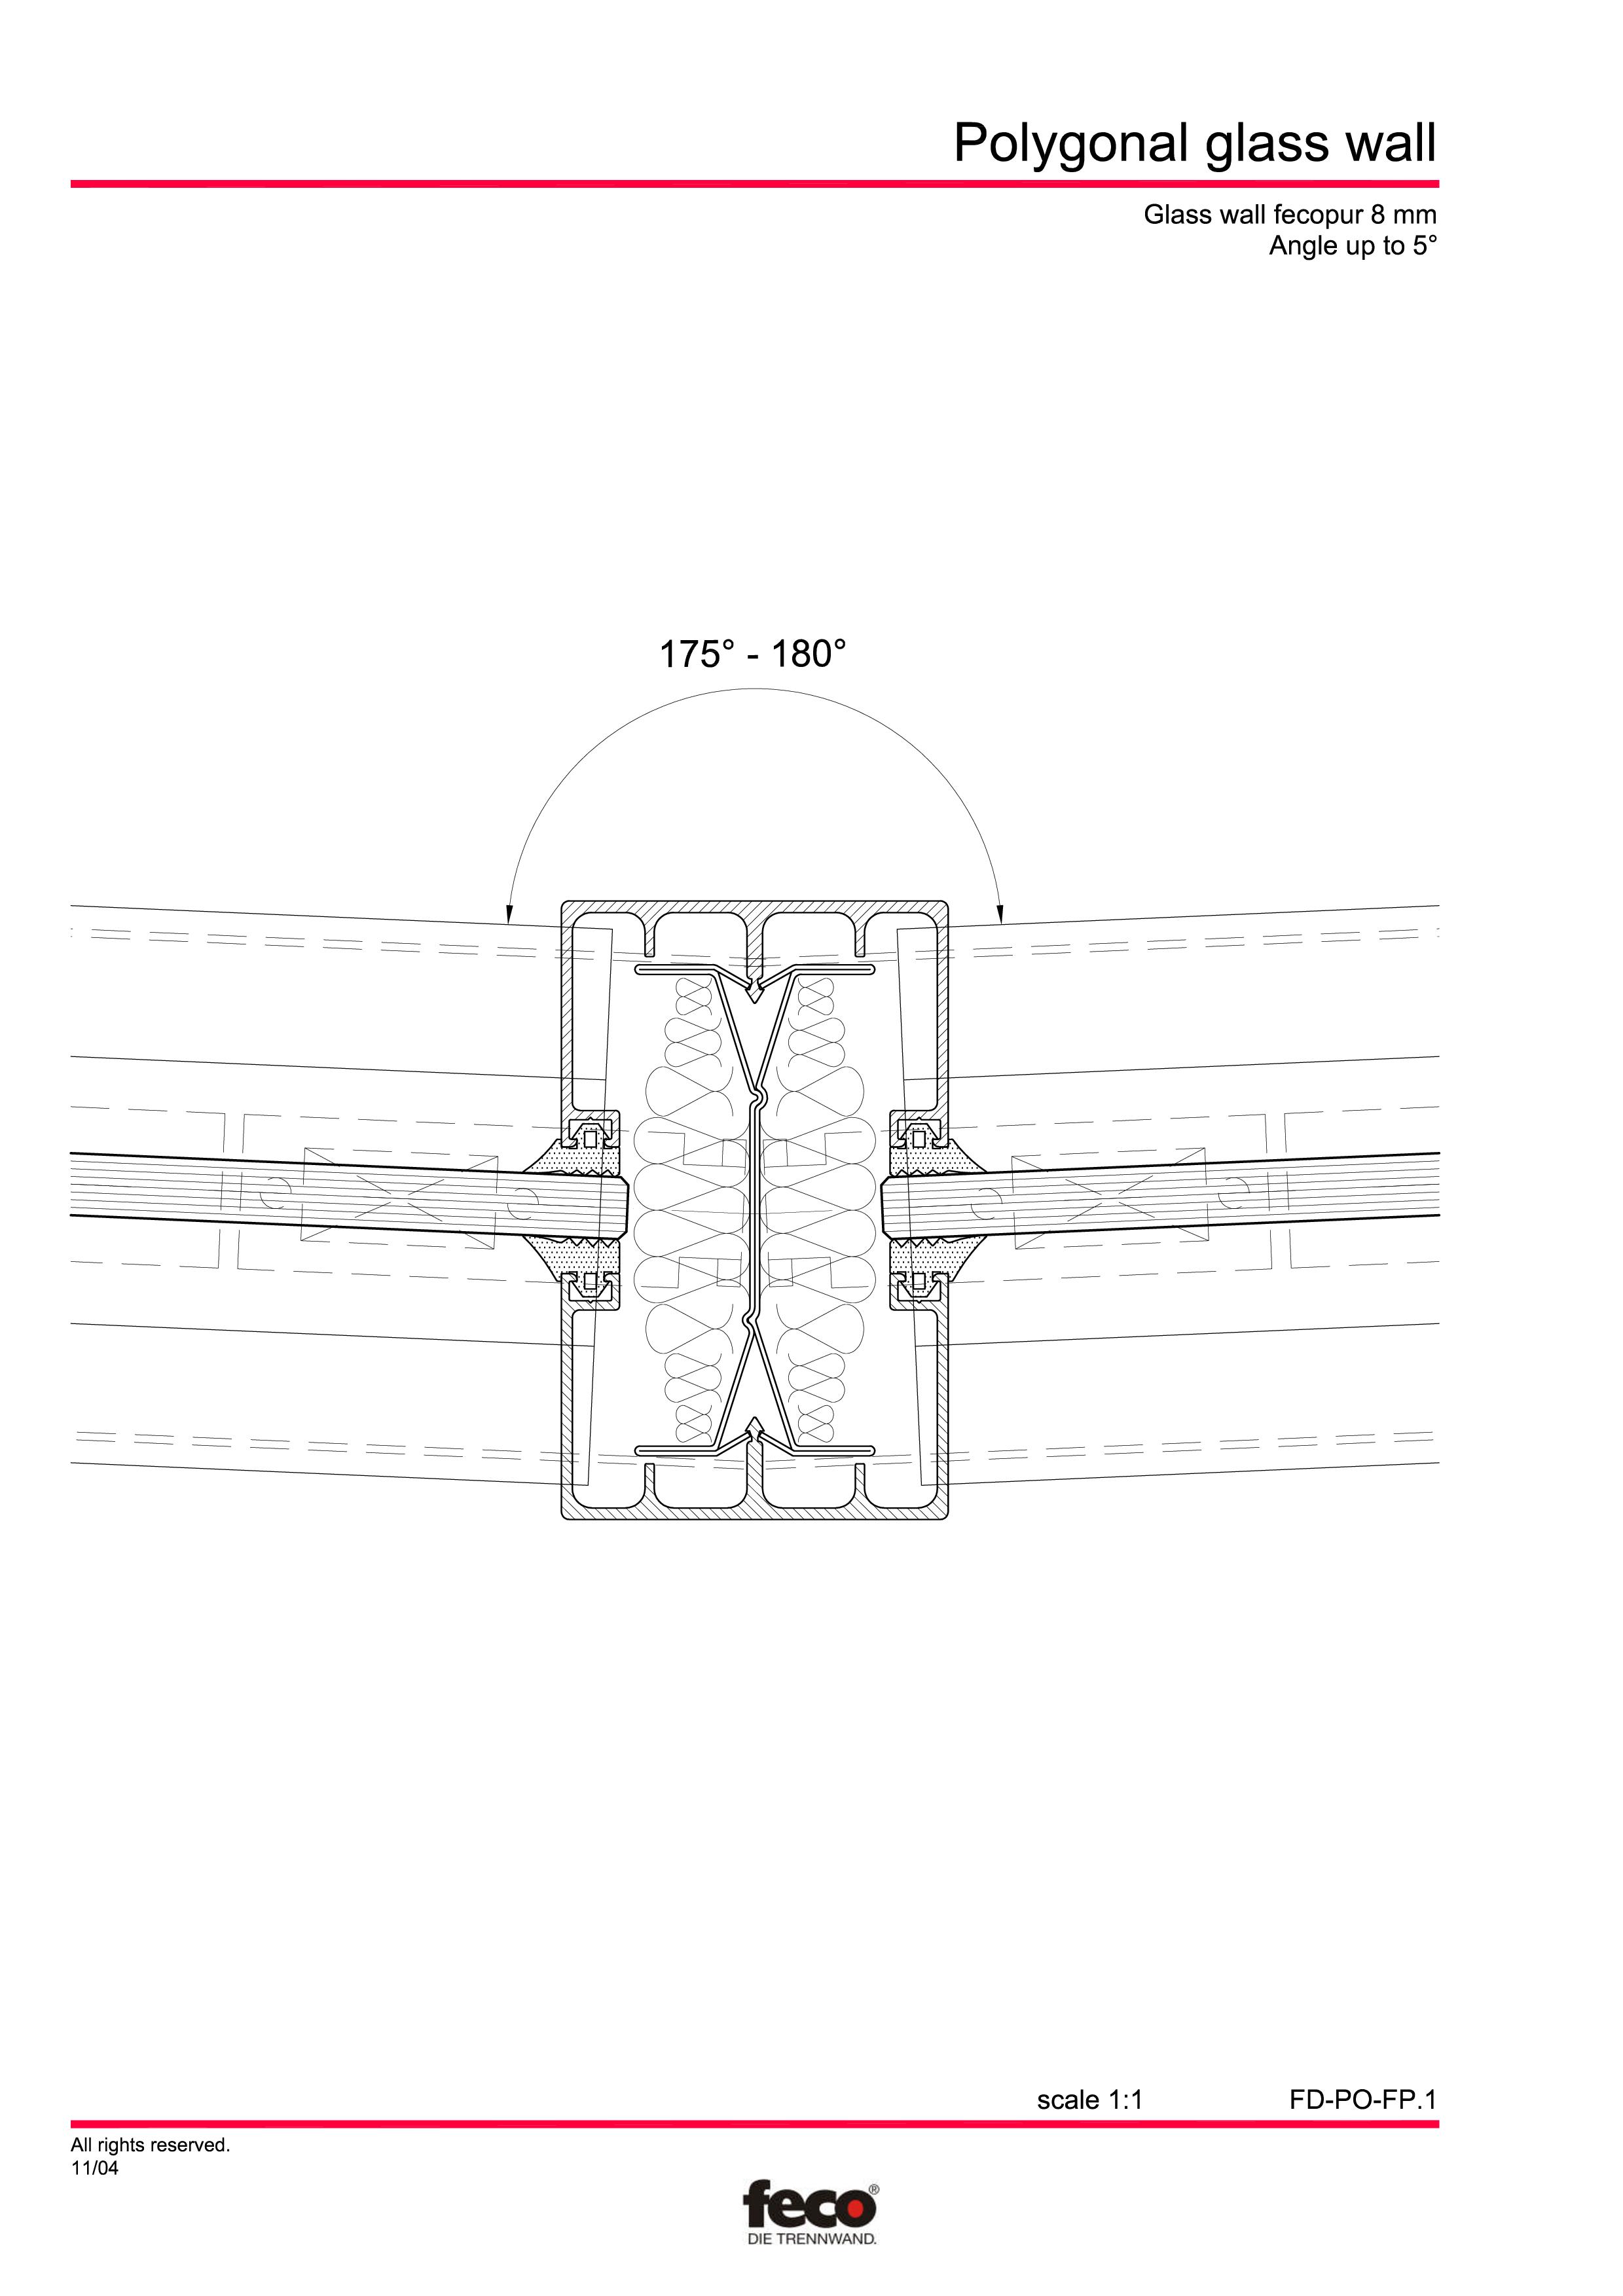 Pagina 3 - CAD-PDF Pereti de compartimentare poligonali FECO Detaliu de montaj FecoFix, FecoPur